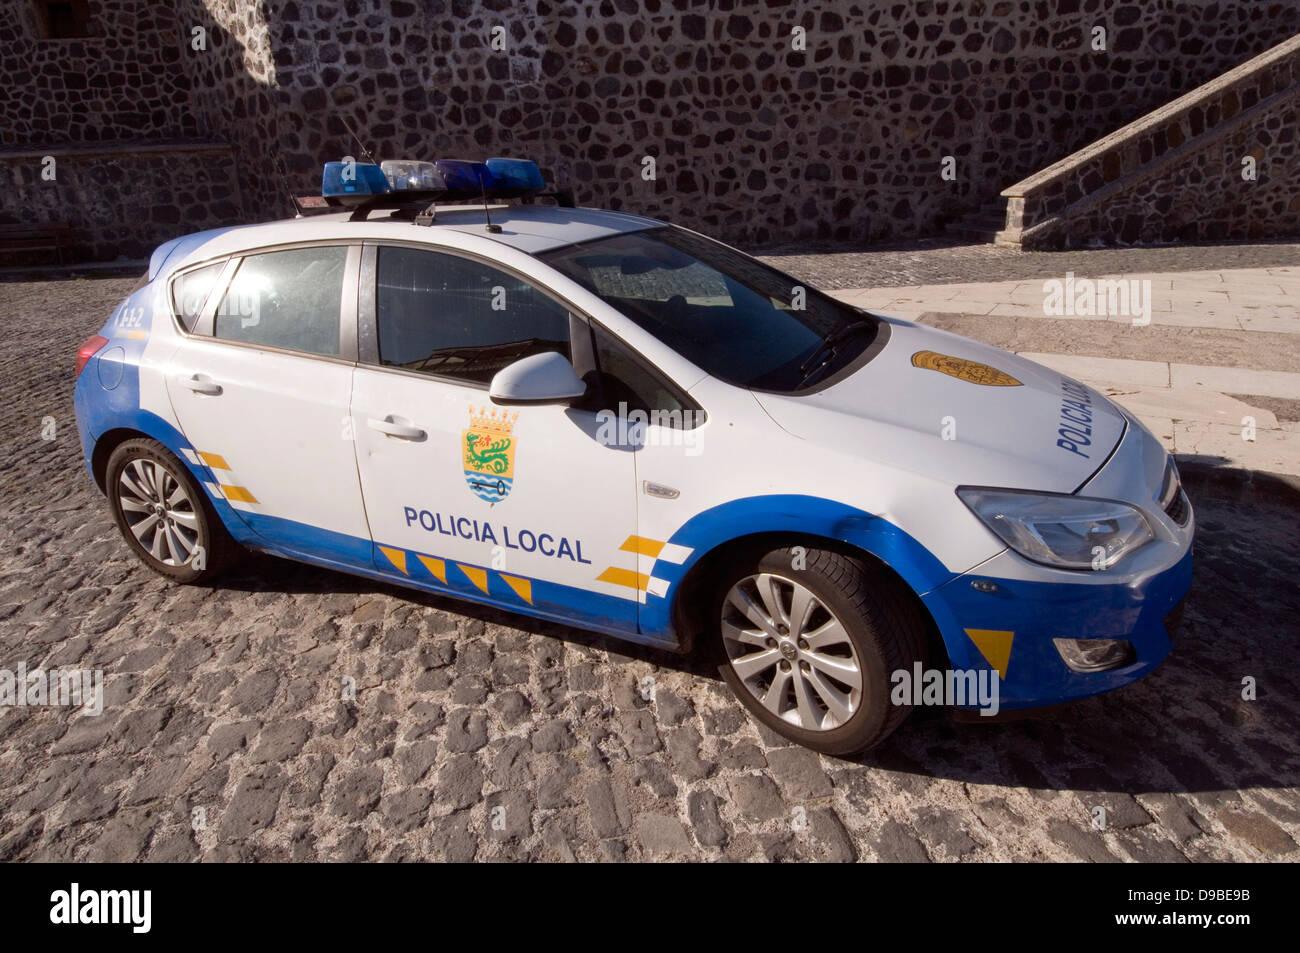 Spanish Police Car Spain Opel Vauxhall Astra Kadet Cars Law Stock